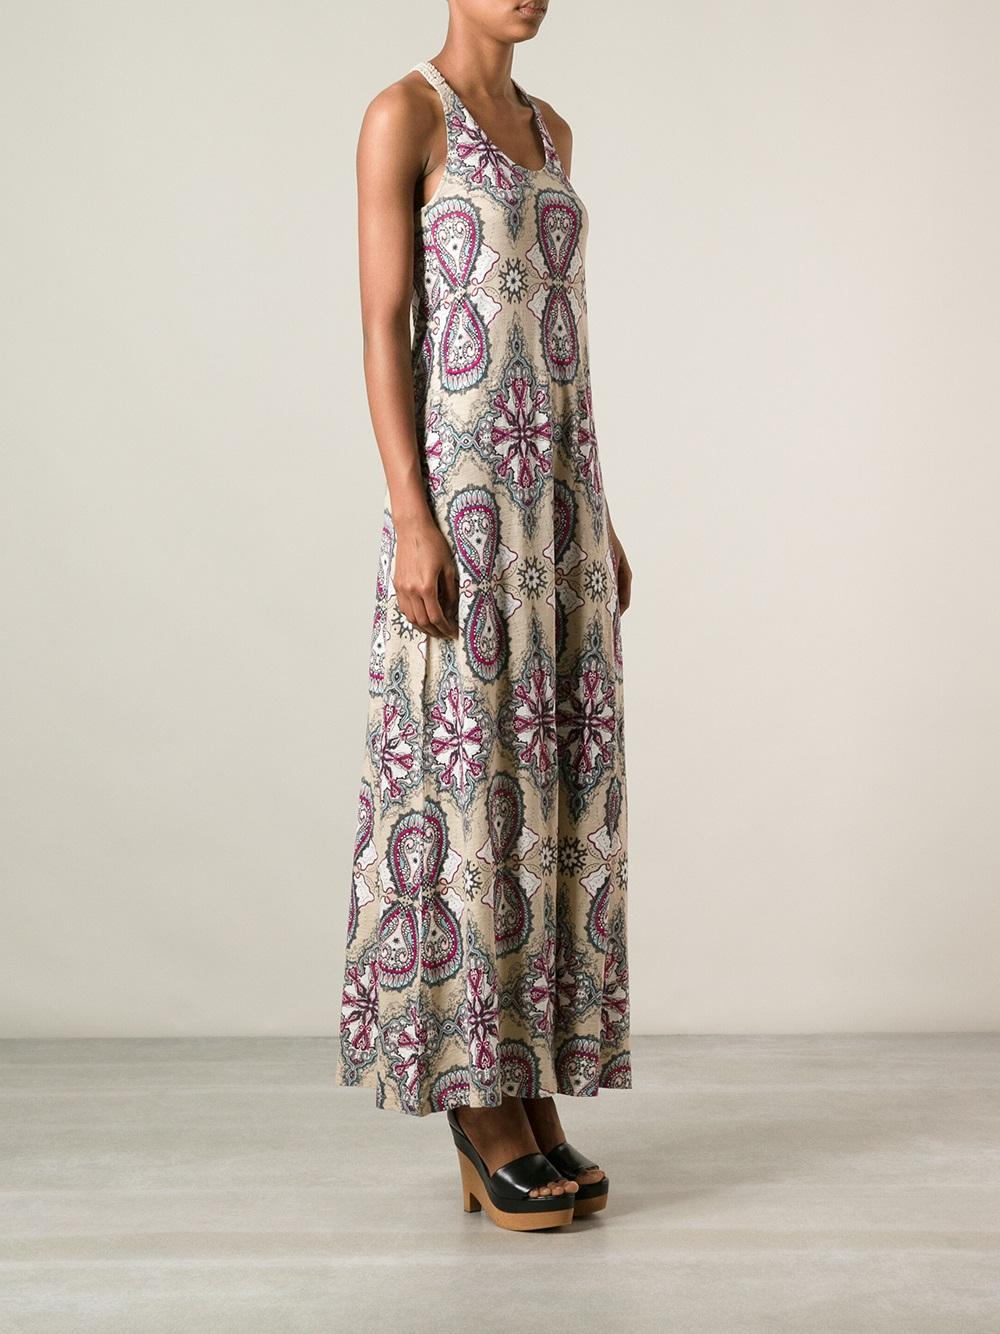 369b2a2bf301 Odd Molly Missrs Printed Maxi Dress - Lyst